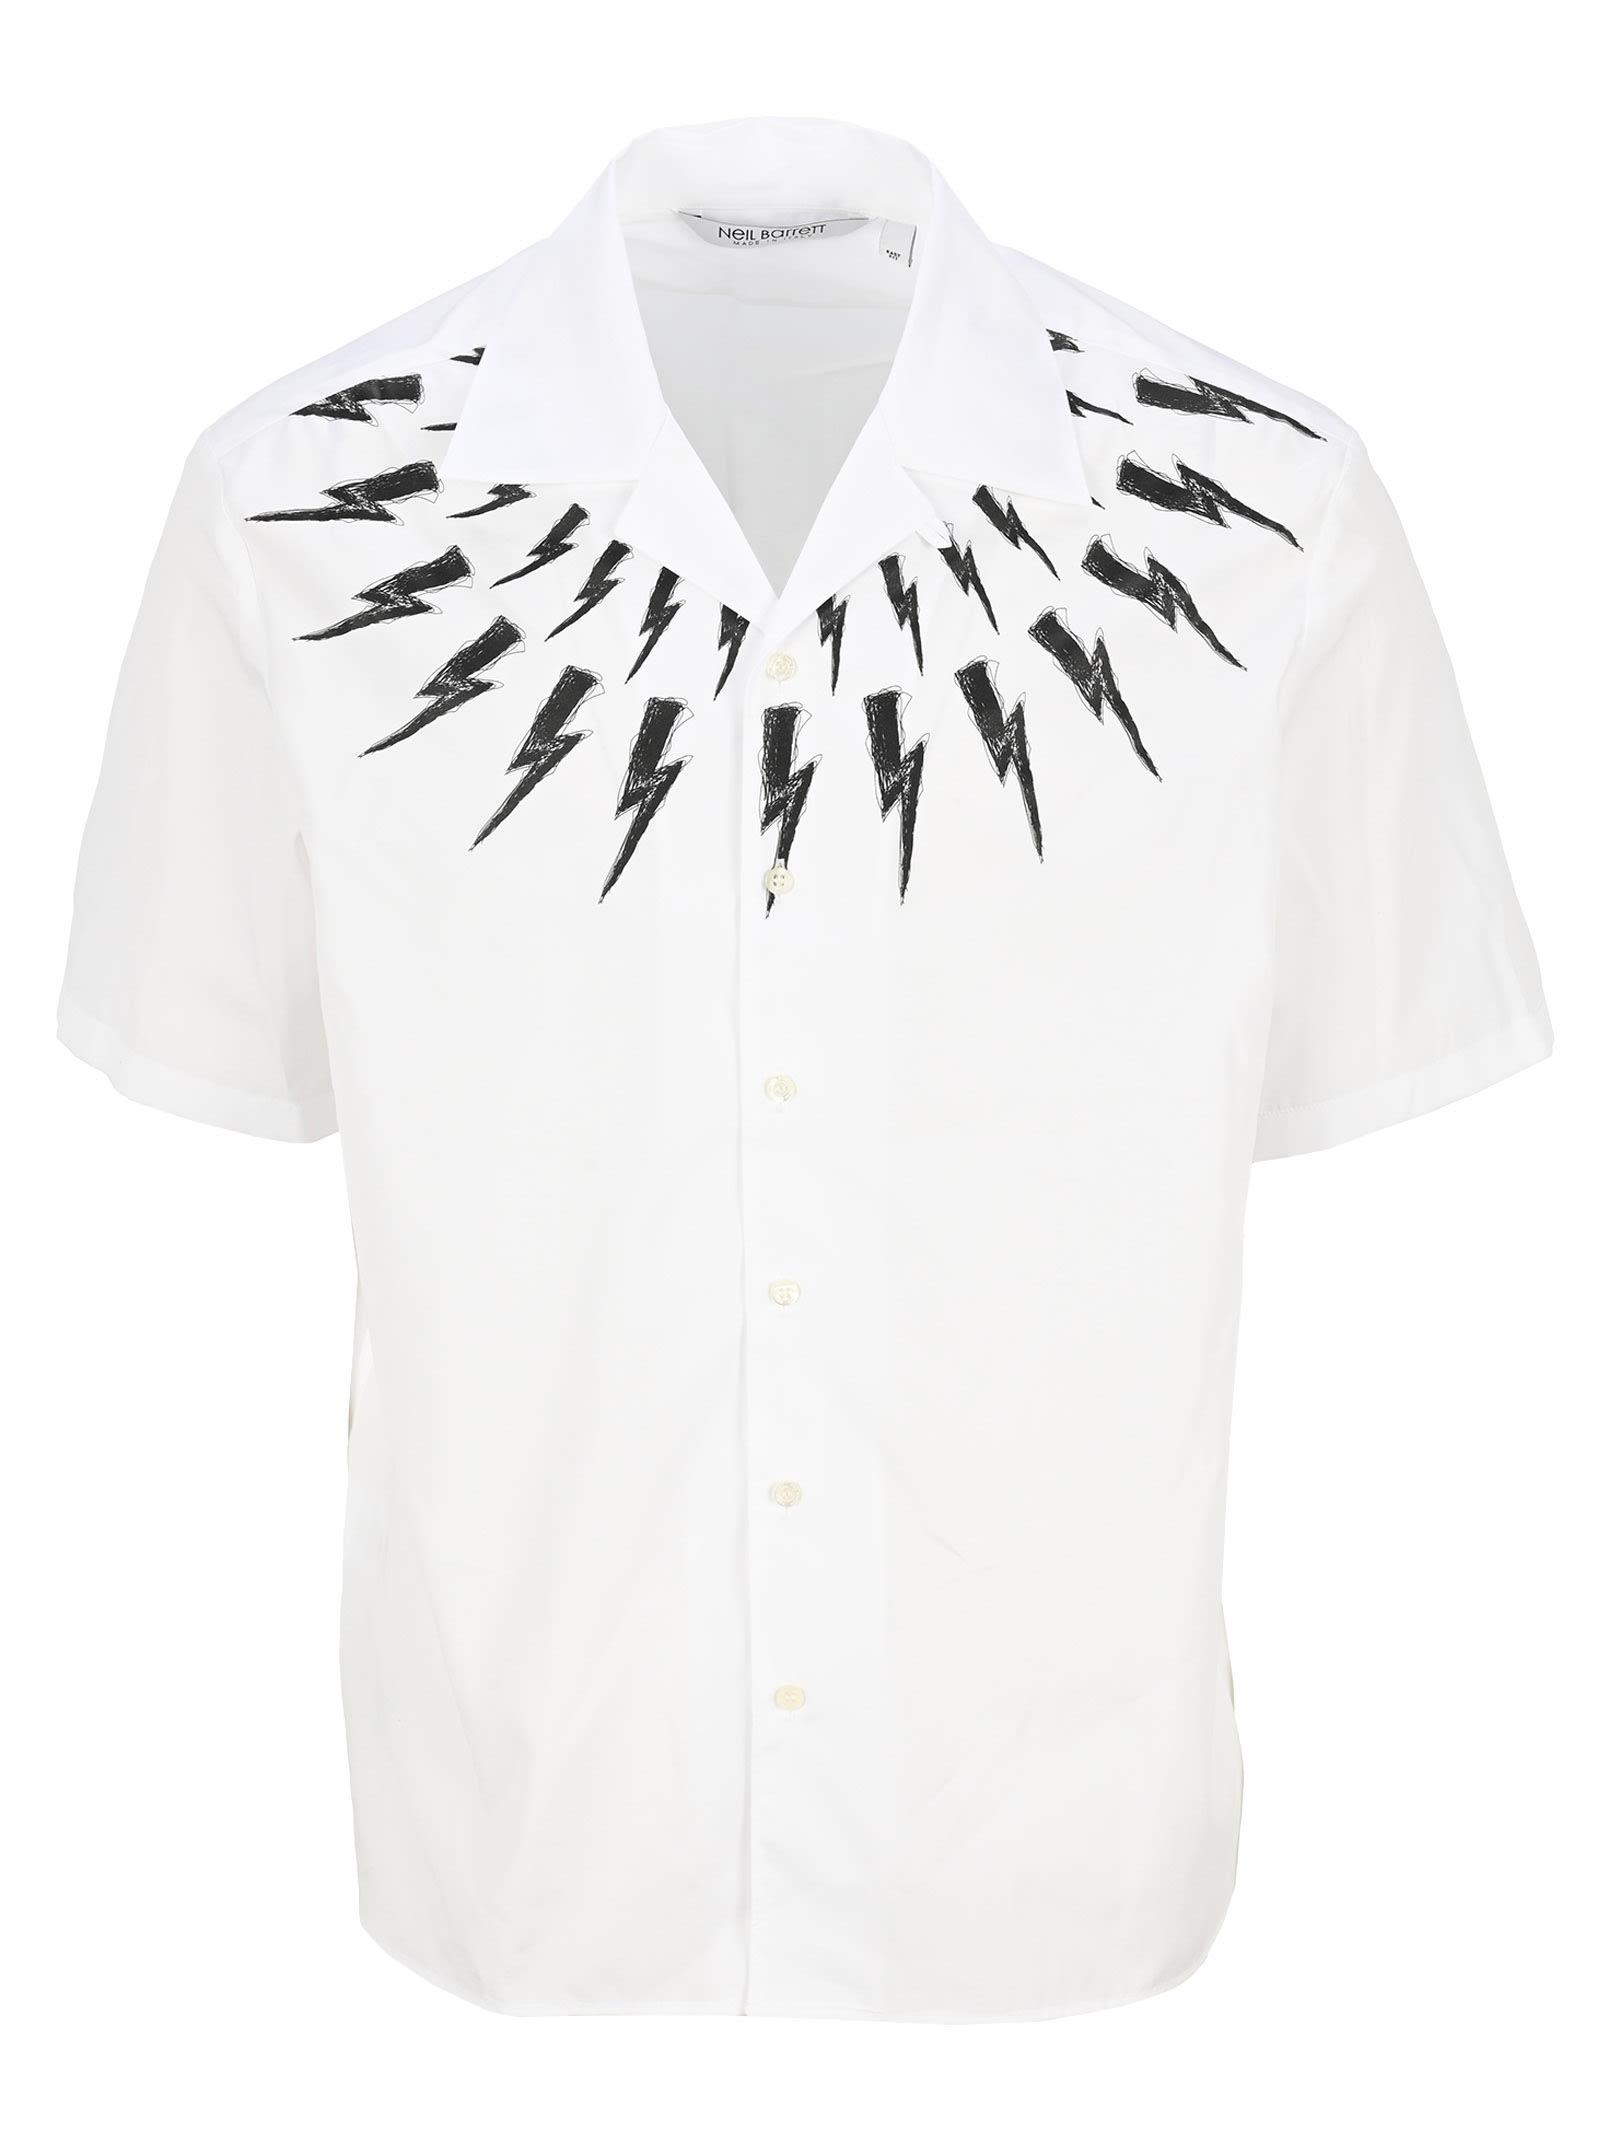 Neil Barrett Shirts FAIR-ISLE THUNDERBOLT HAWAIIAN SHIRT